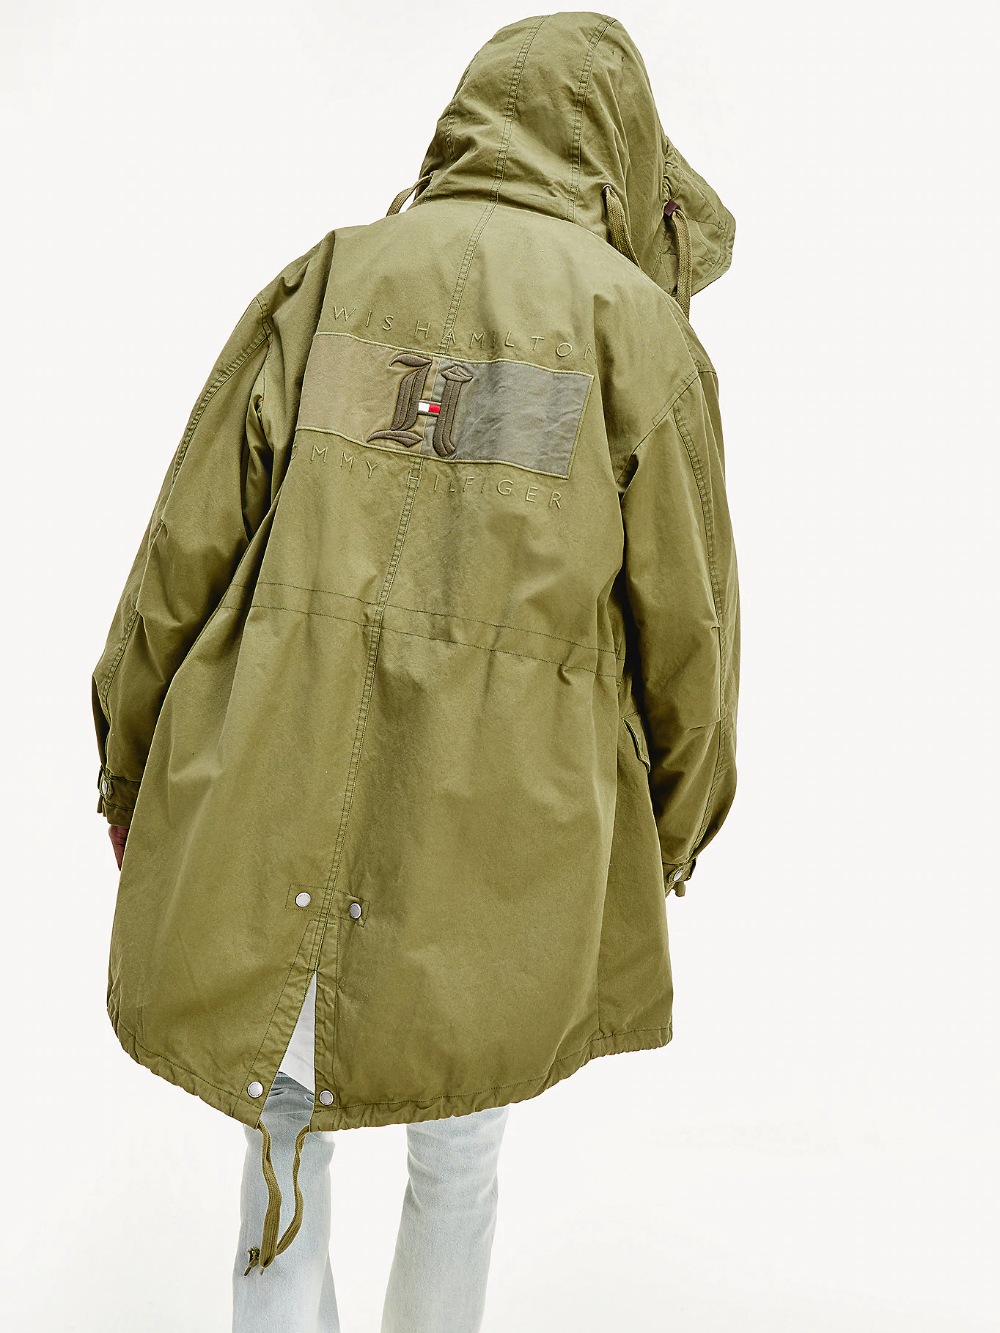 Lewis Hamilton Parka Green Tommy Hilfiger Outerwear Jackets Tommy Hilfiger Men S Coats Jackets [ 1333 x 1000 Pixel ]